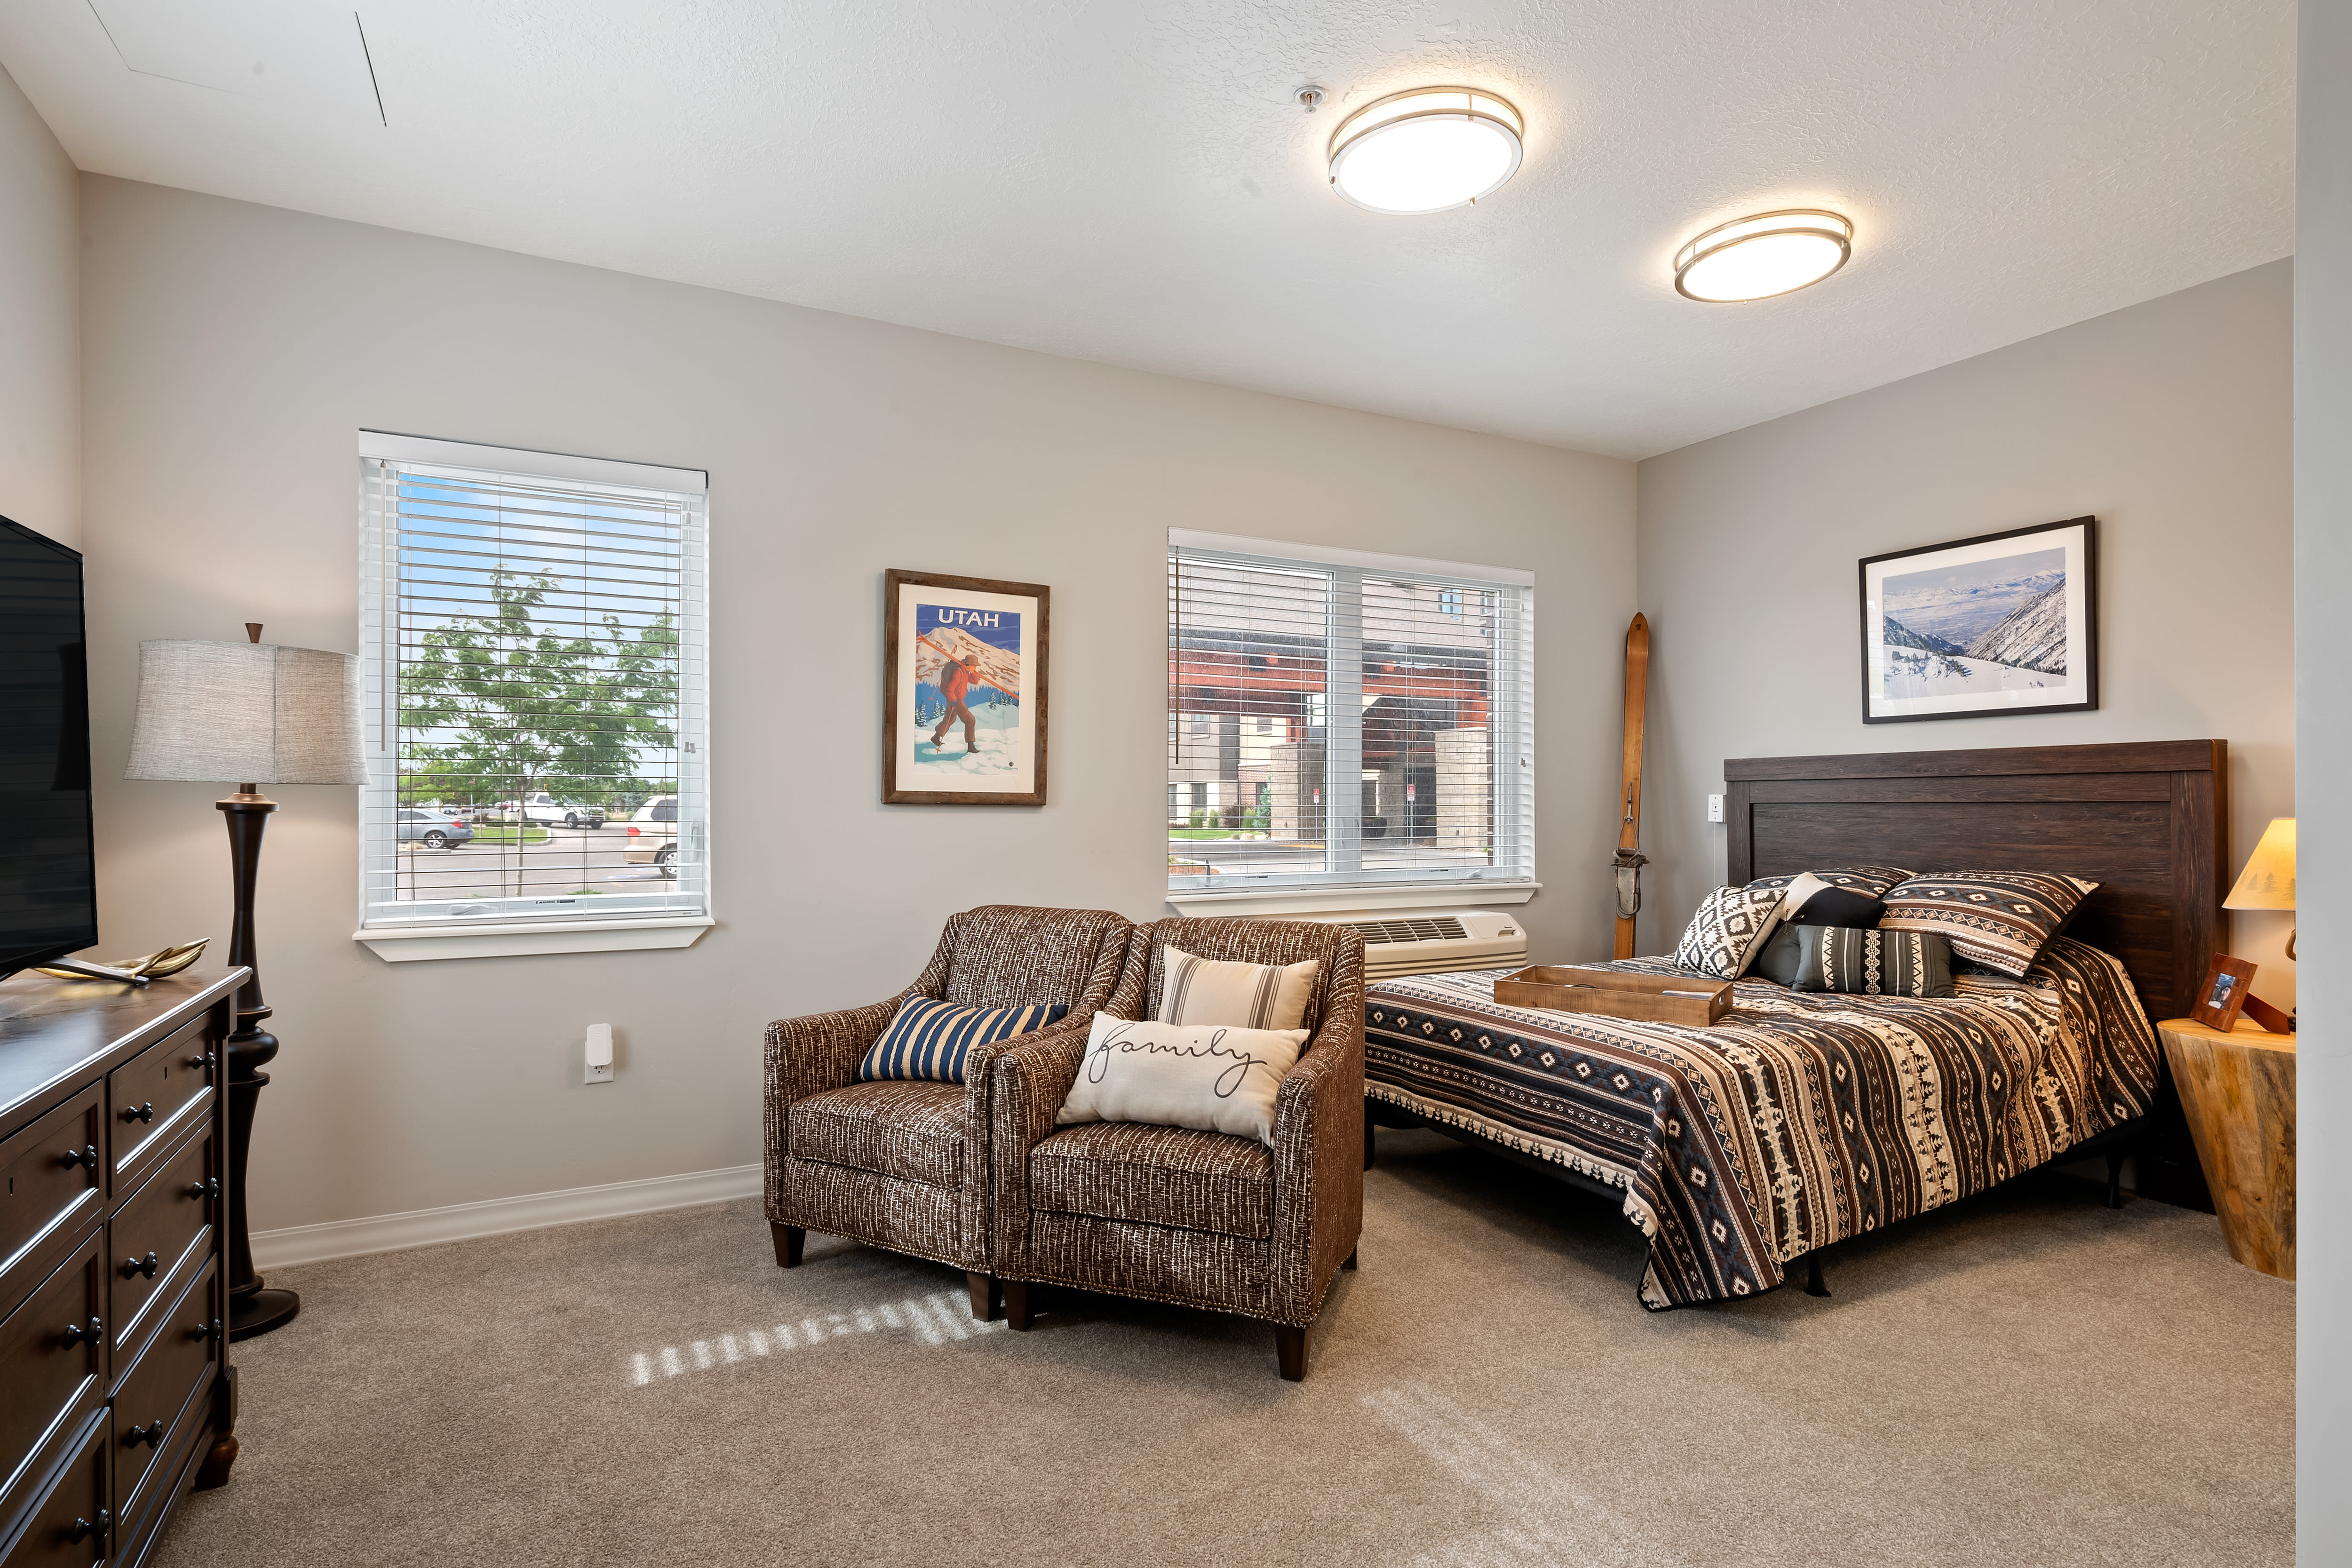 A large resident bedroom at Anthology of South Jordan in South Jordan, Utah